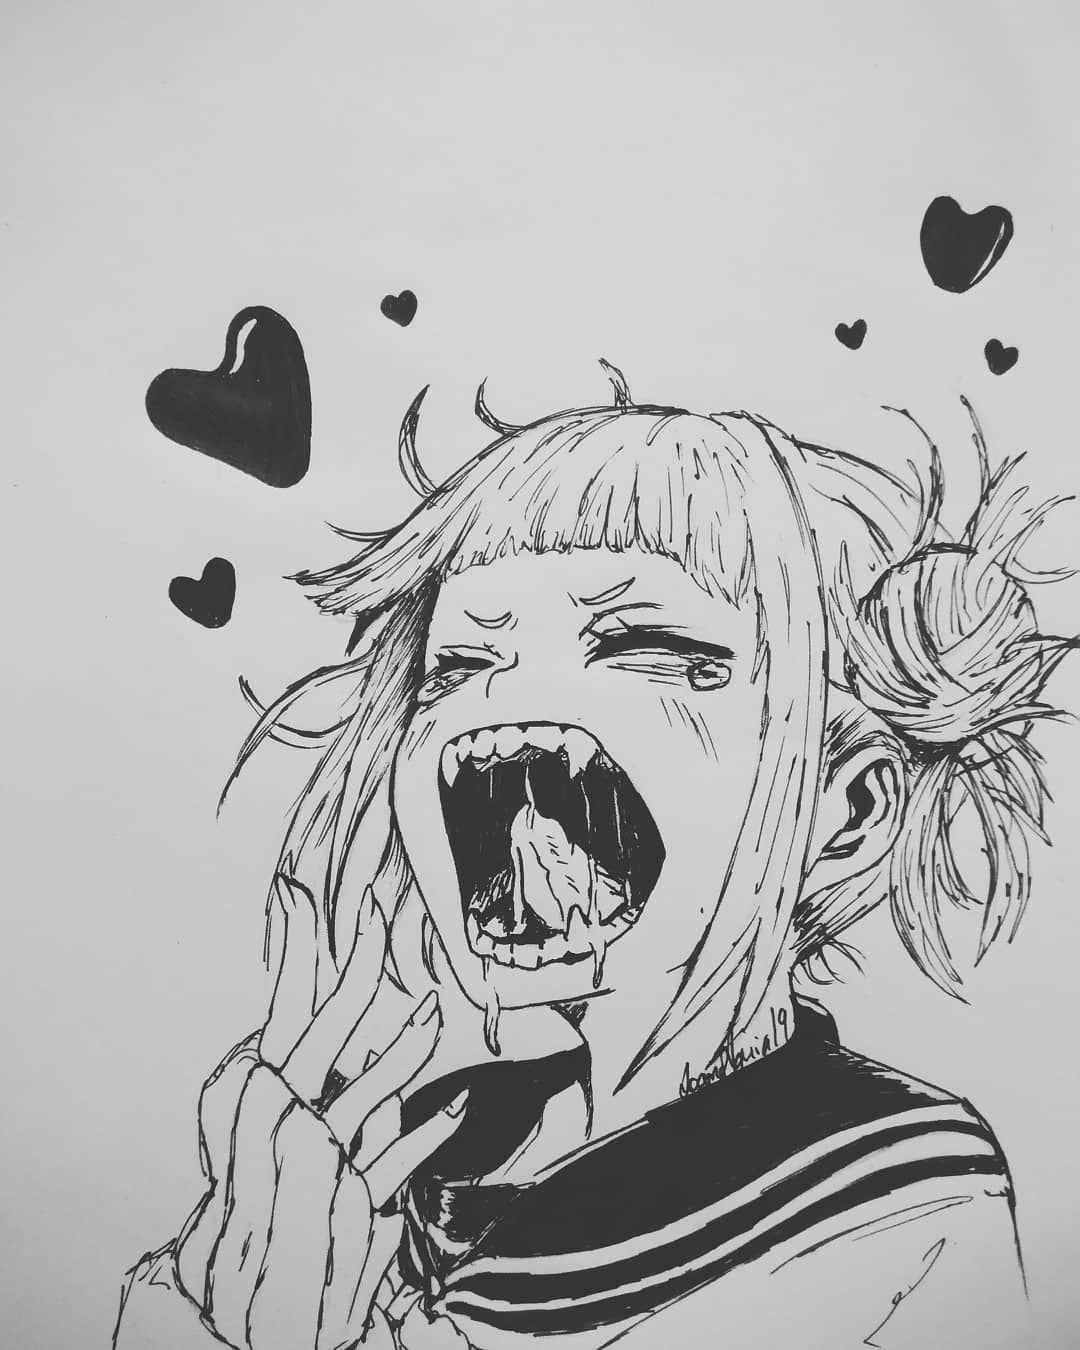 Toga Anime Bokunoheroacademia Myheroacademia Toga Art Himikotoga Heart Mha Bnha Toga Anime Anime Drawings Anime Anime Drawings Sketches